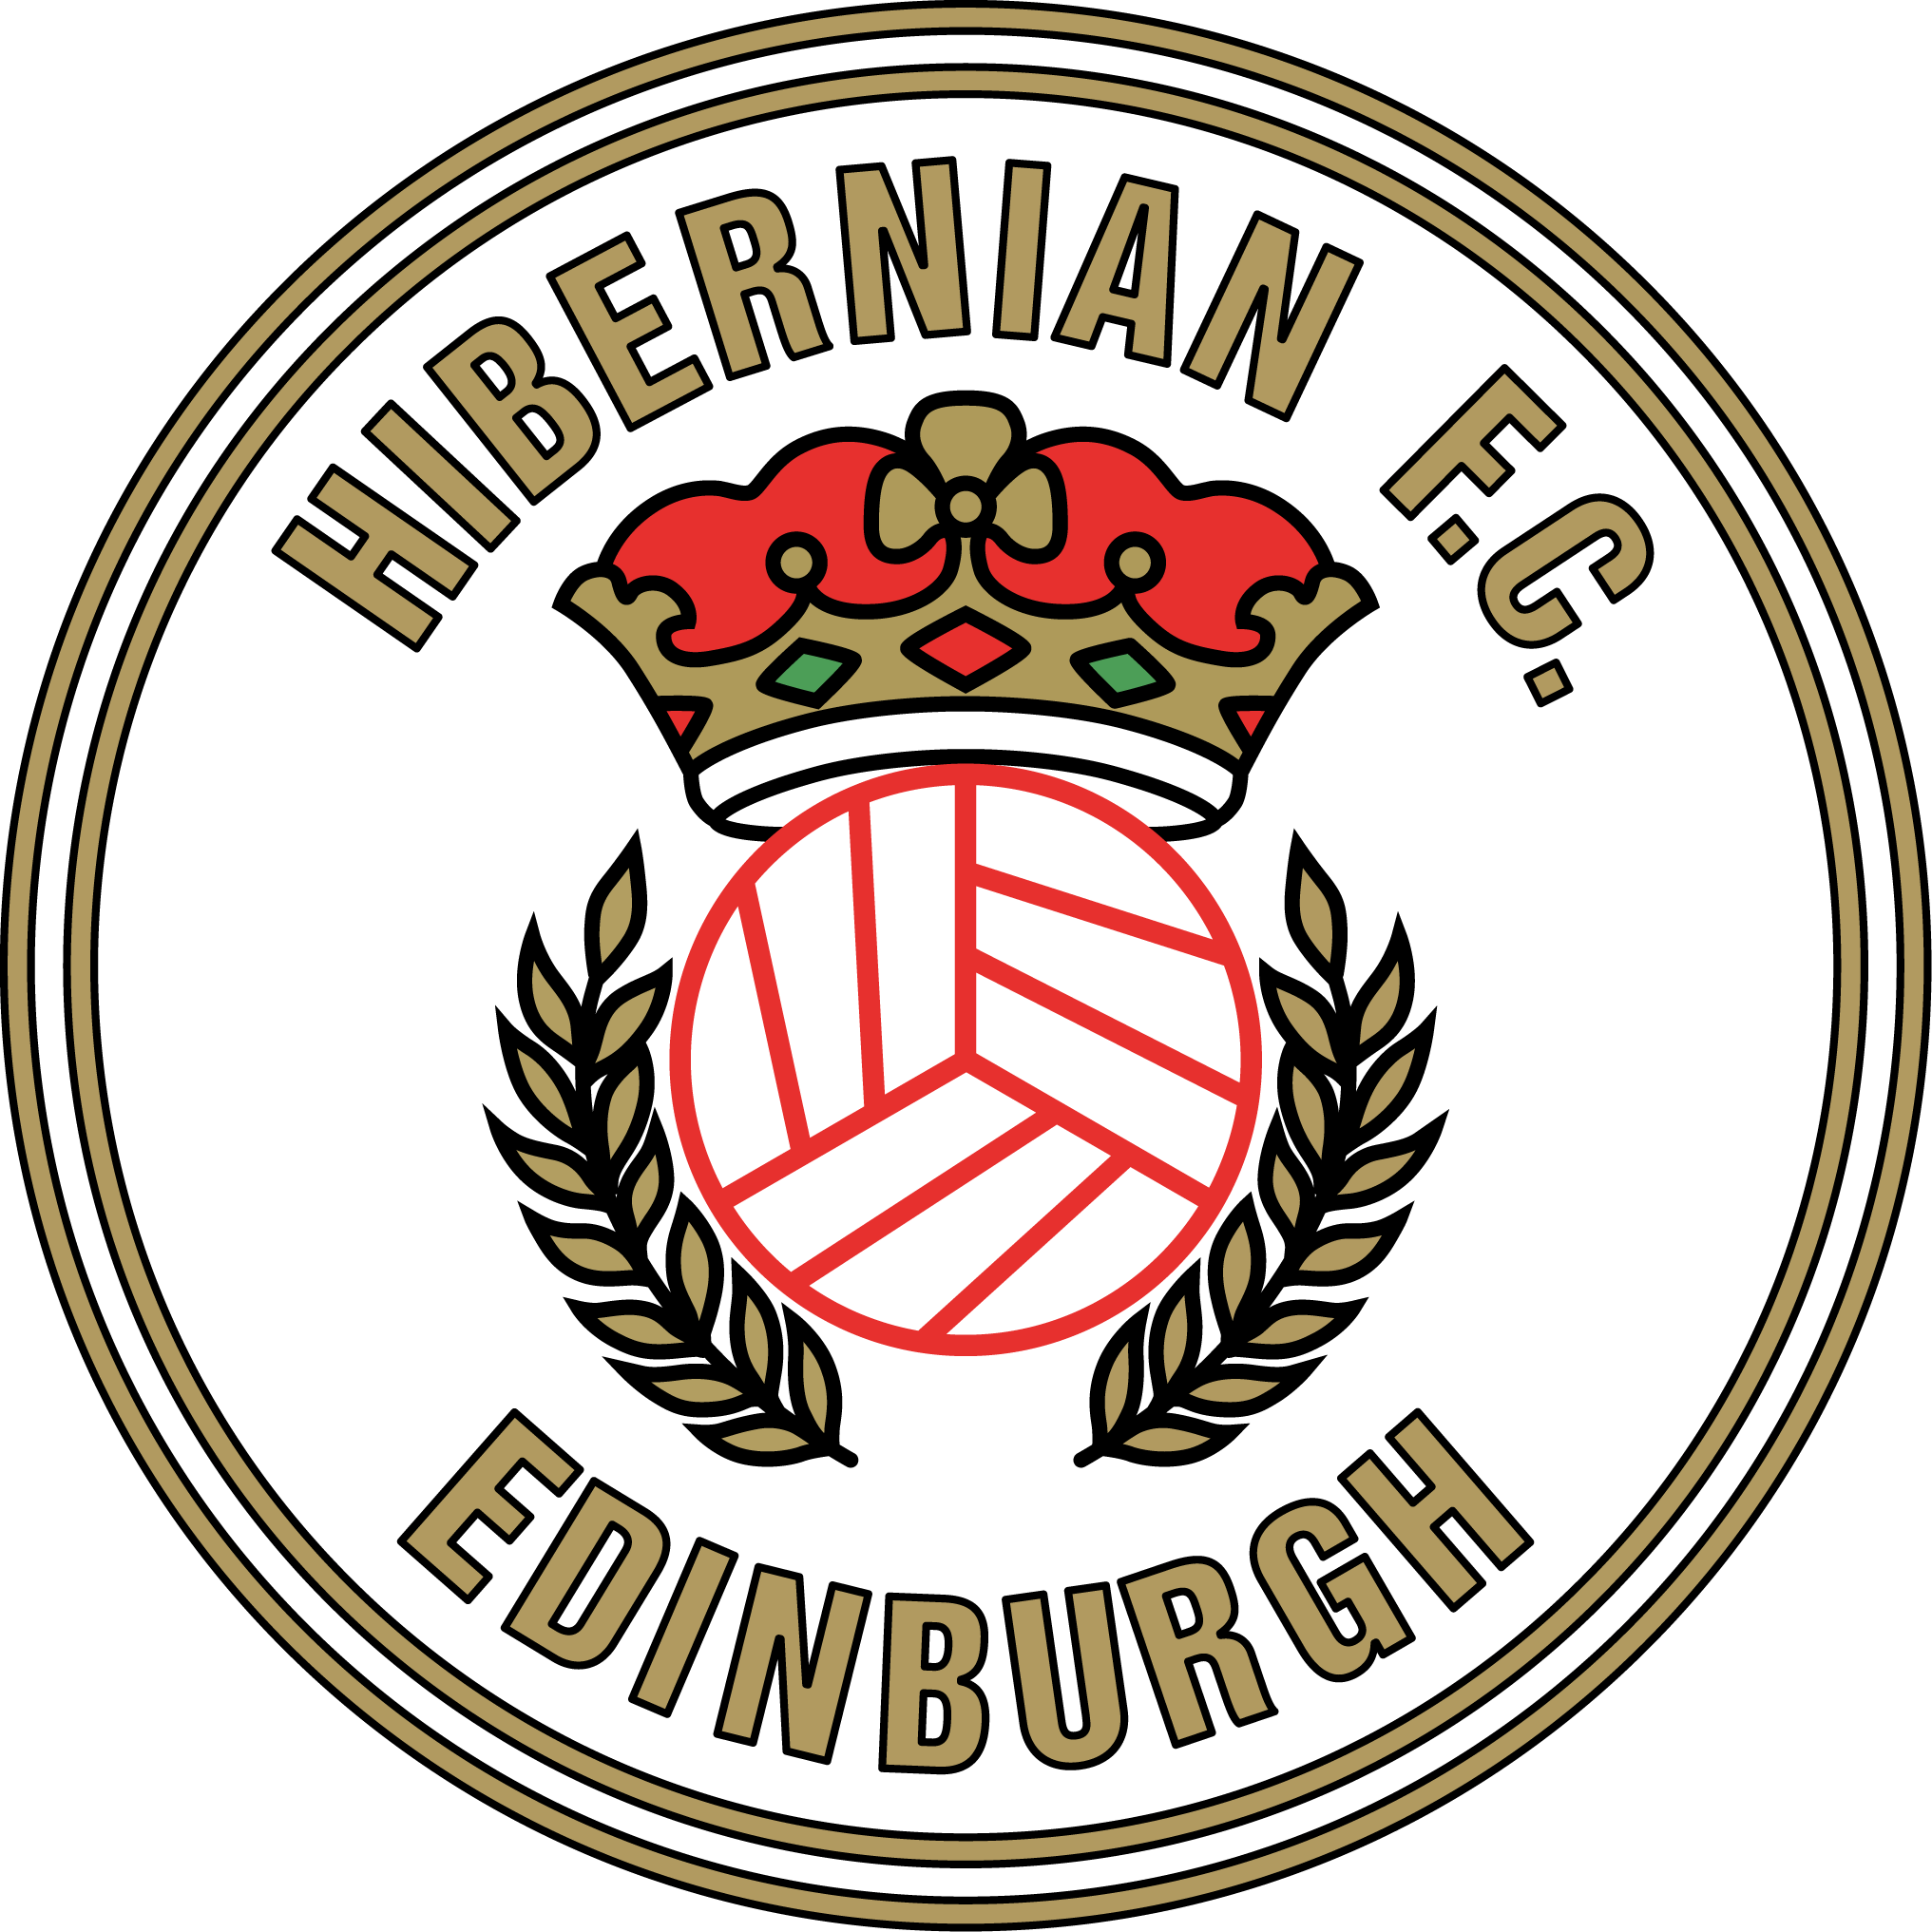 Coat Of Arms Of City Of Edinburgh Scotland Coat Of Arms Edinburgh Arms